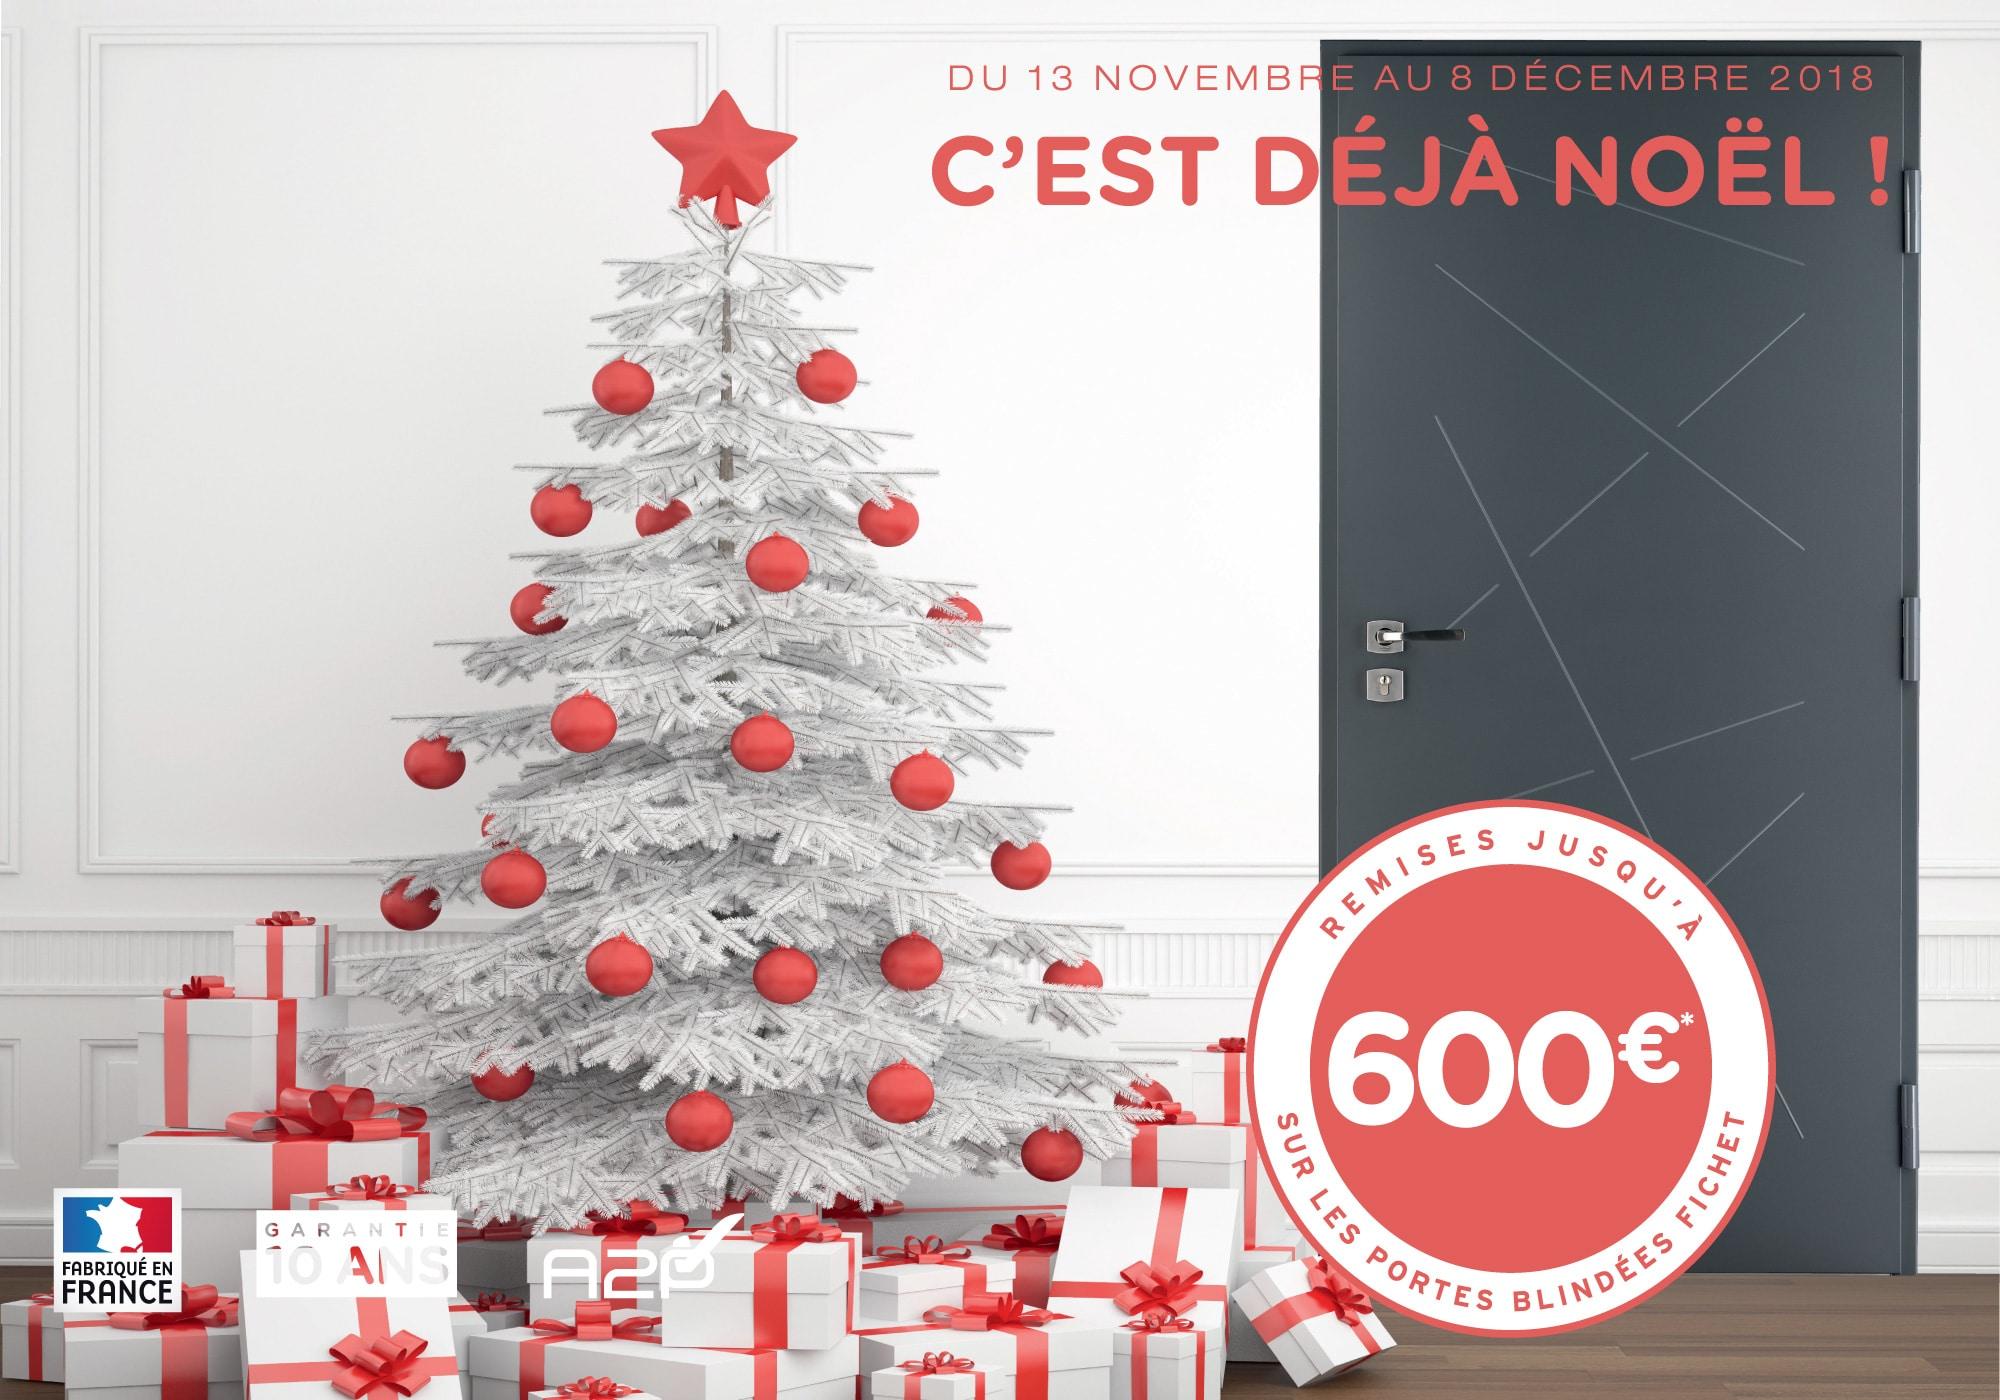 Opération Fichet Noël avant Noël 2018